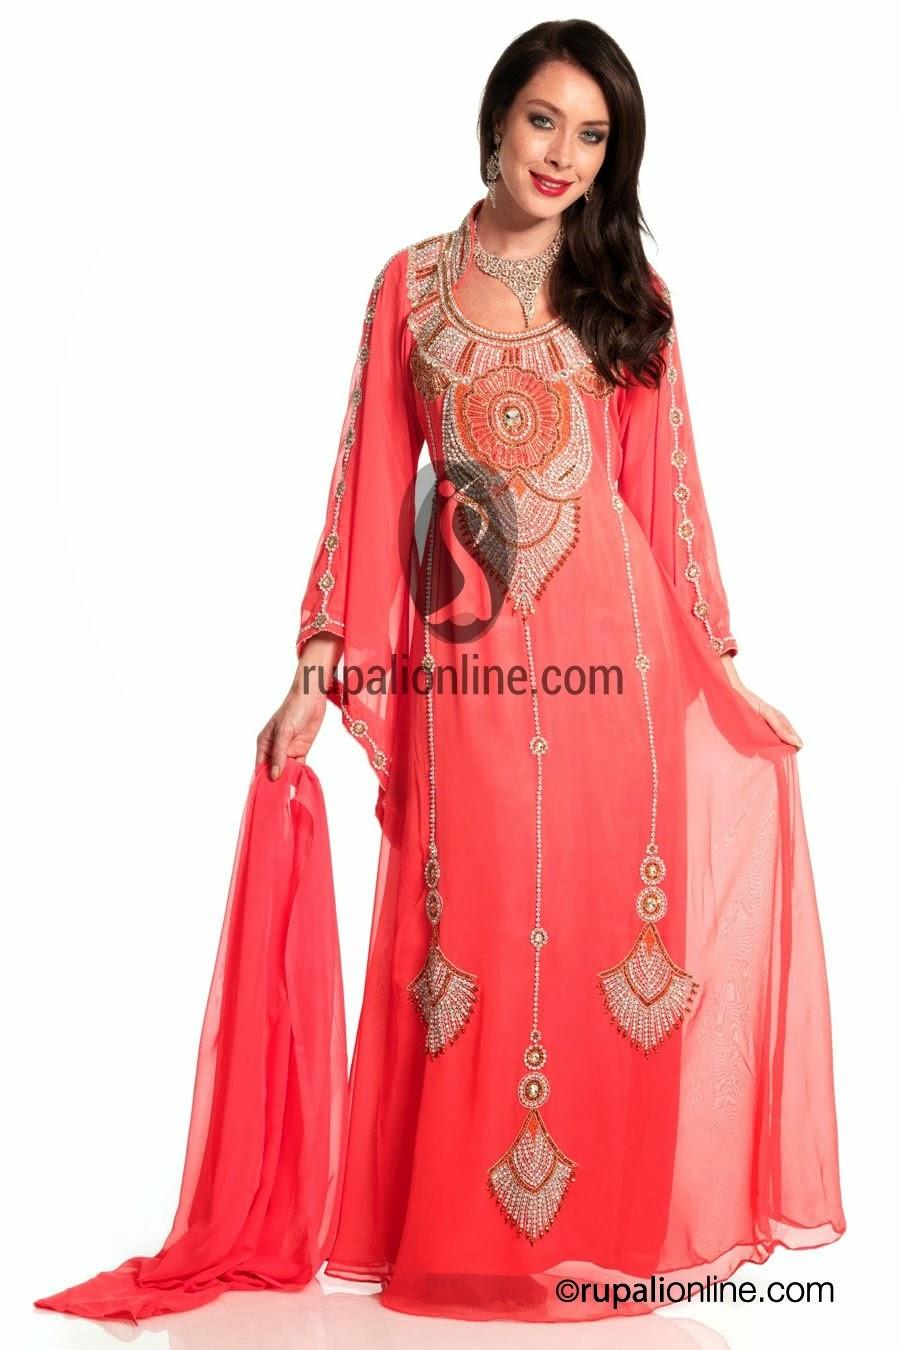 3ddcaefdcc7 New Colors Of Farashas. Asian Functional Wear Farasha Collection